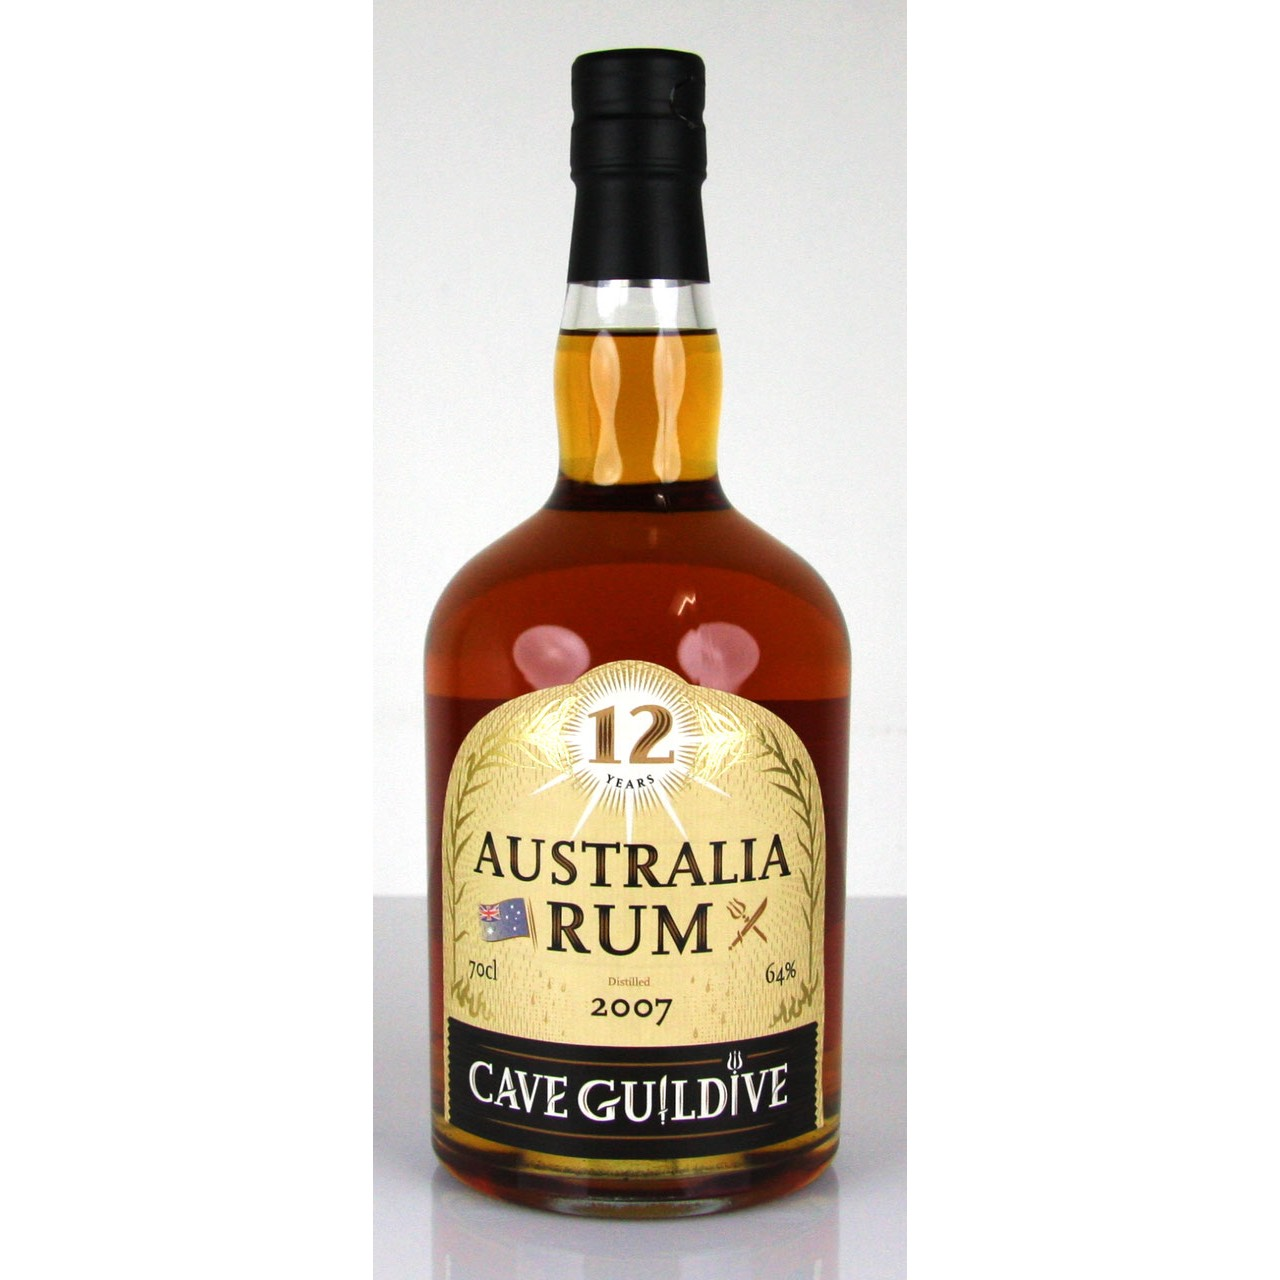 Bottle image of Australia Rum